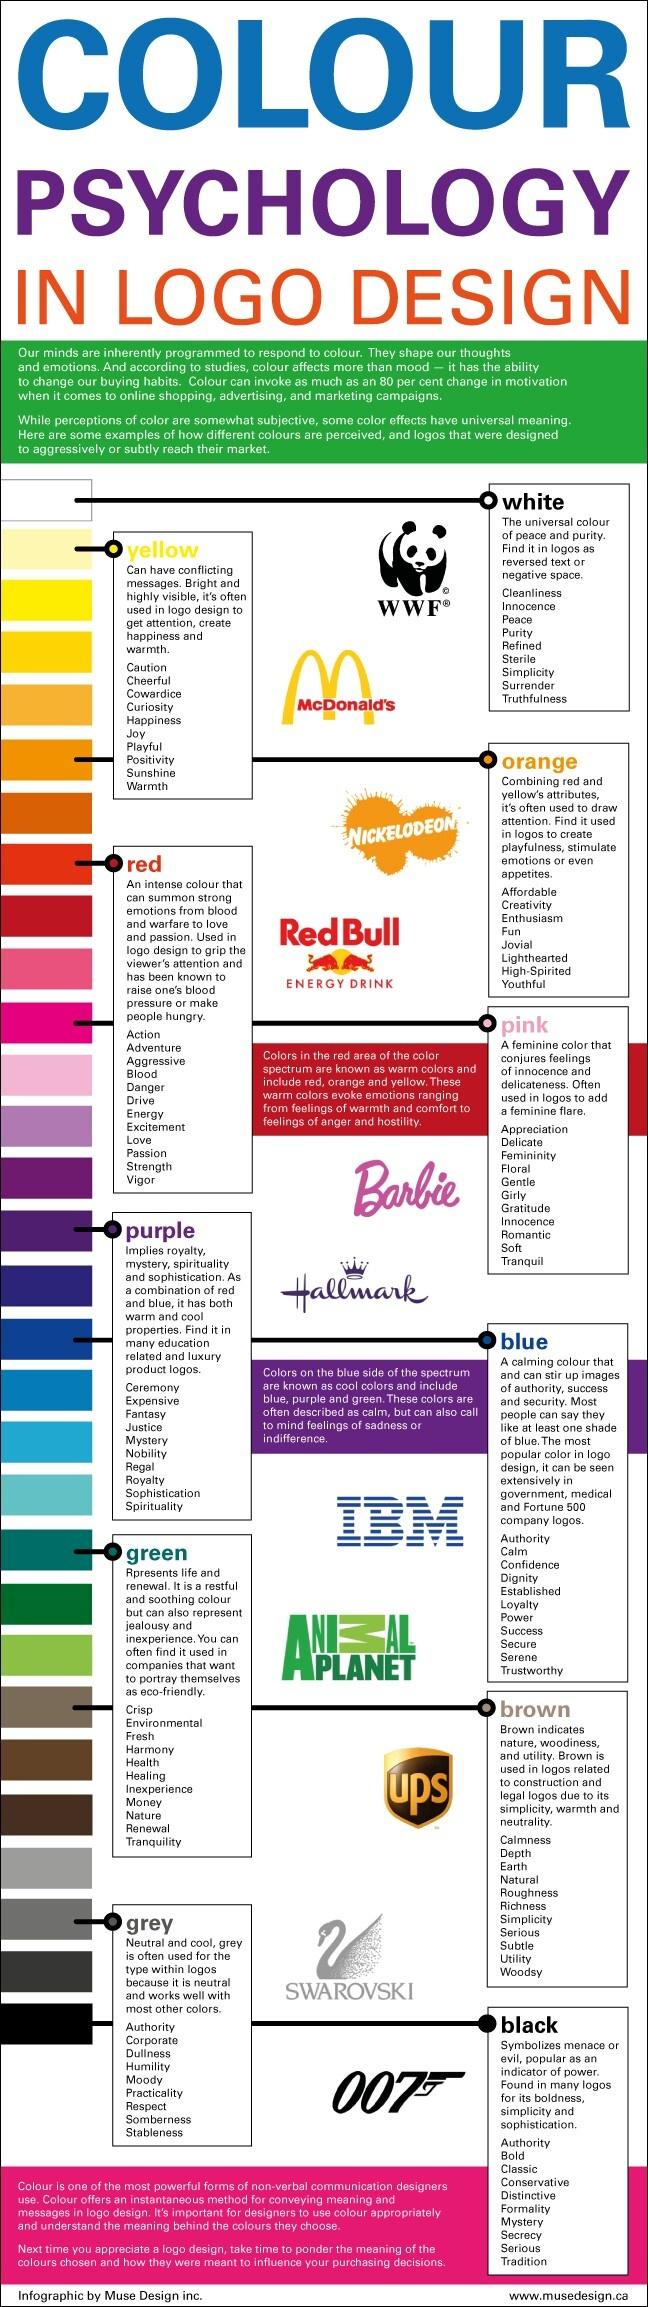 Logo color branding, cool infographic for designers! #logo #design #color #brand